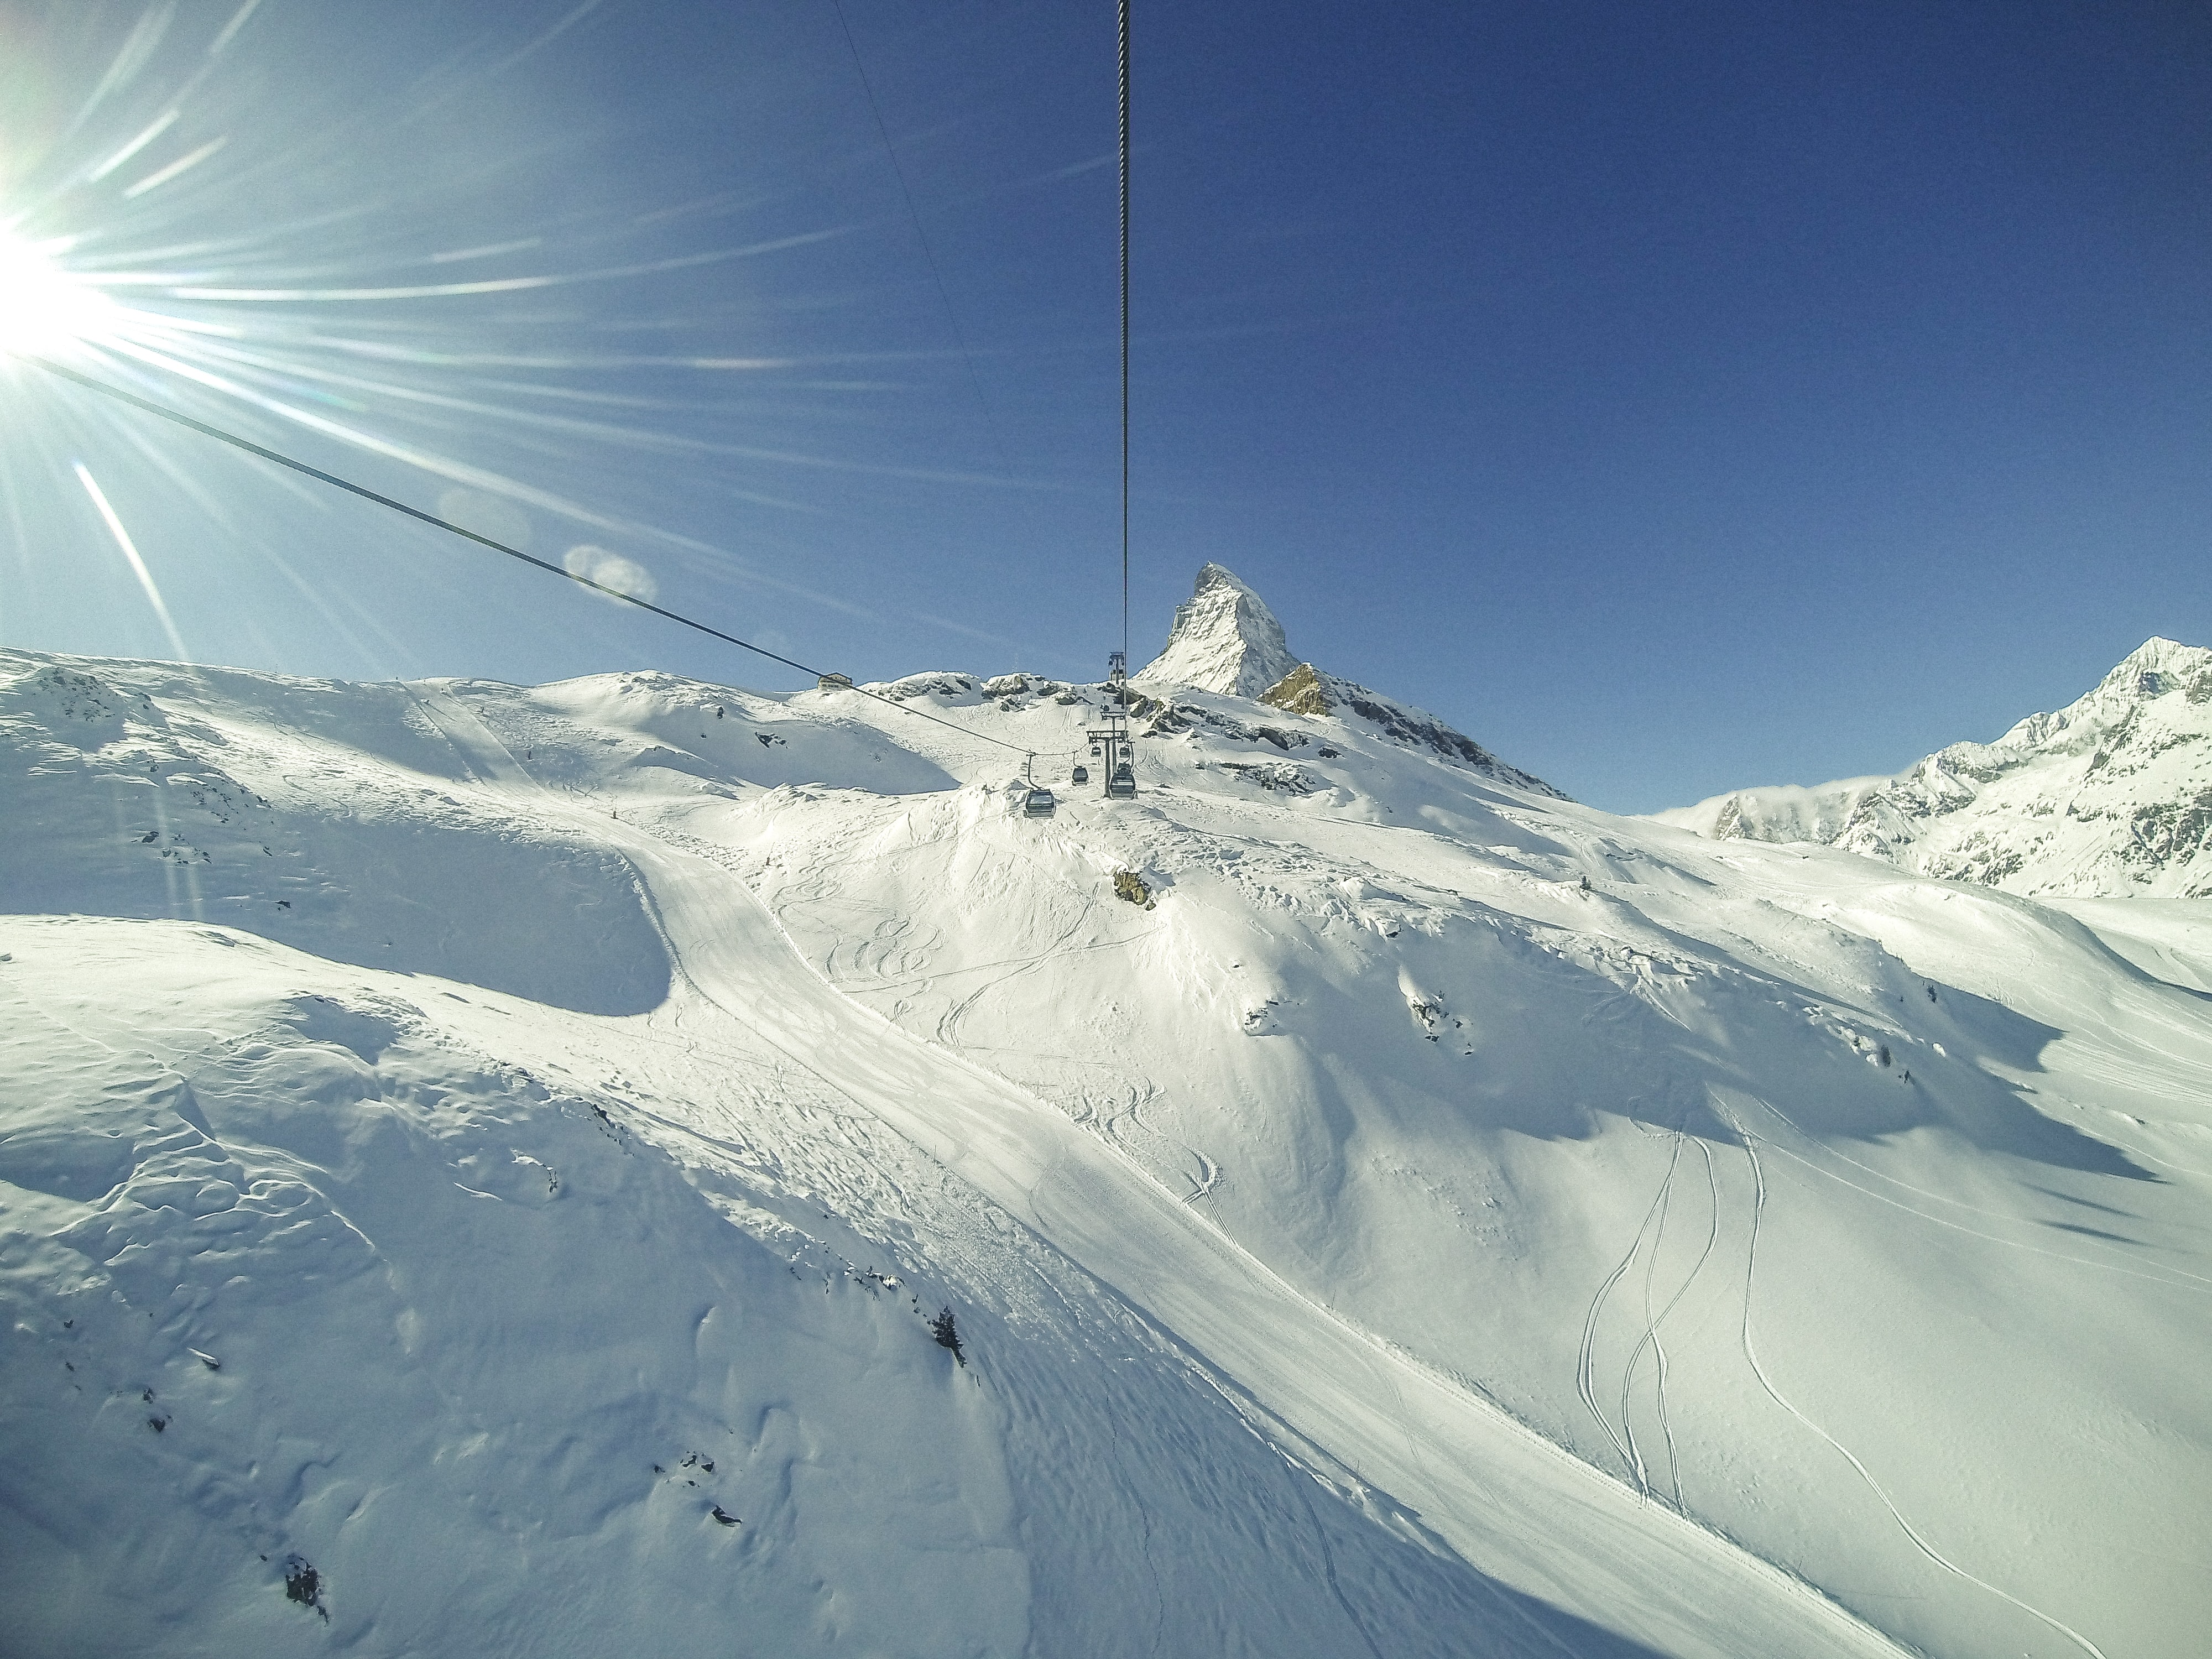 white snowy mountain under blue sky